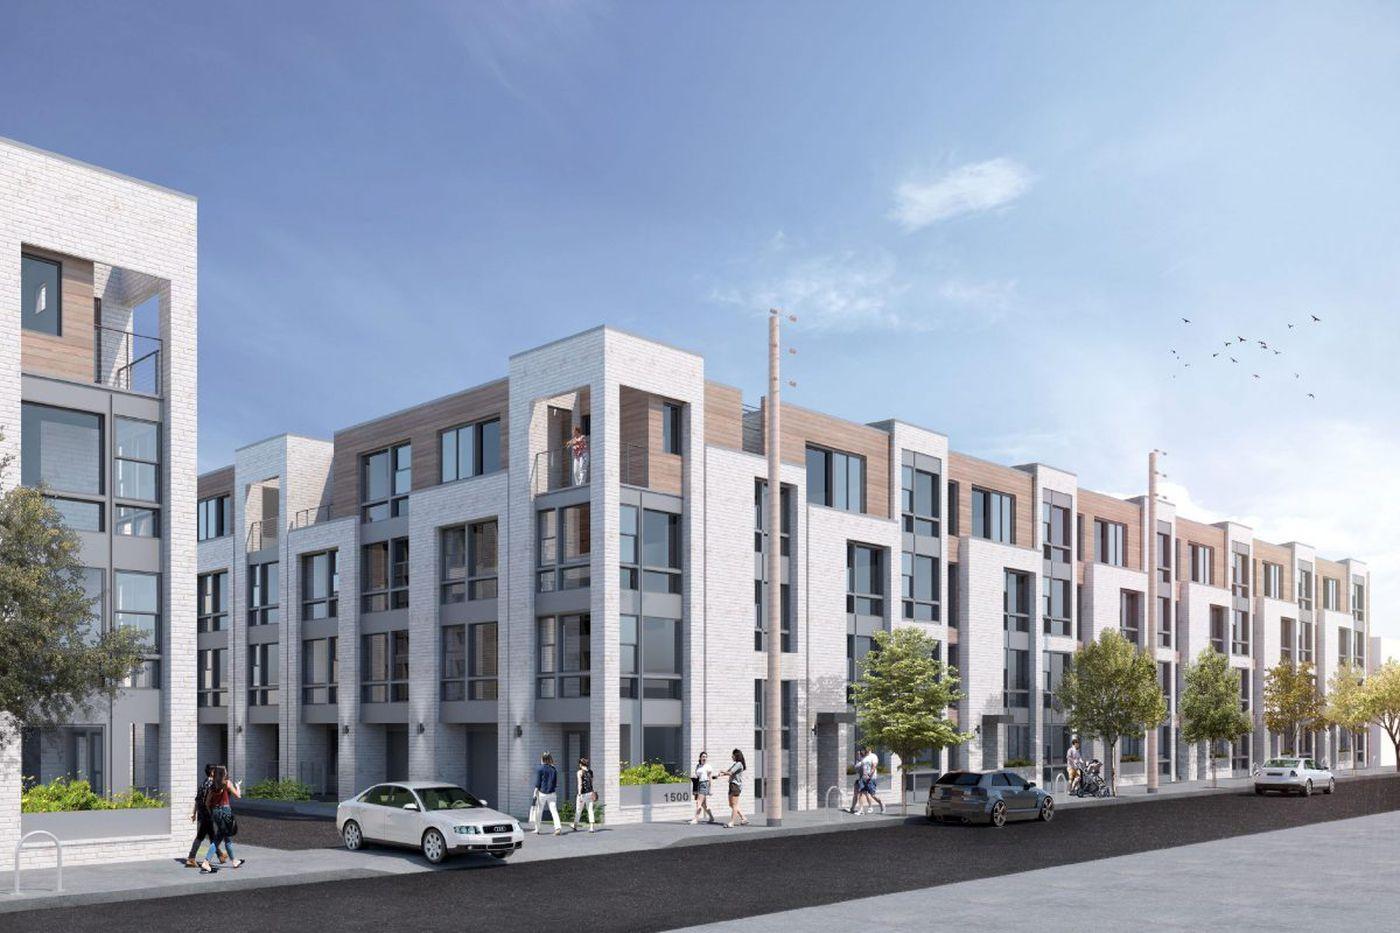 Company led by slain Philly developer Schellenger advances new projects in Poplar, Kensington